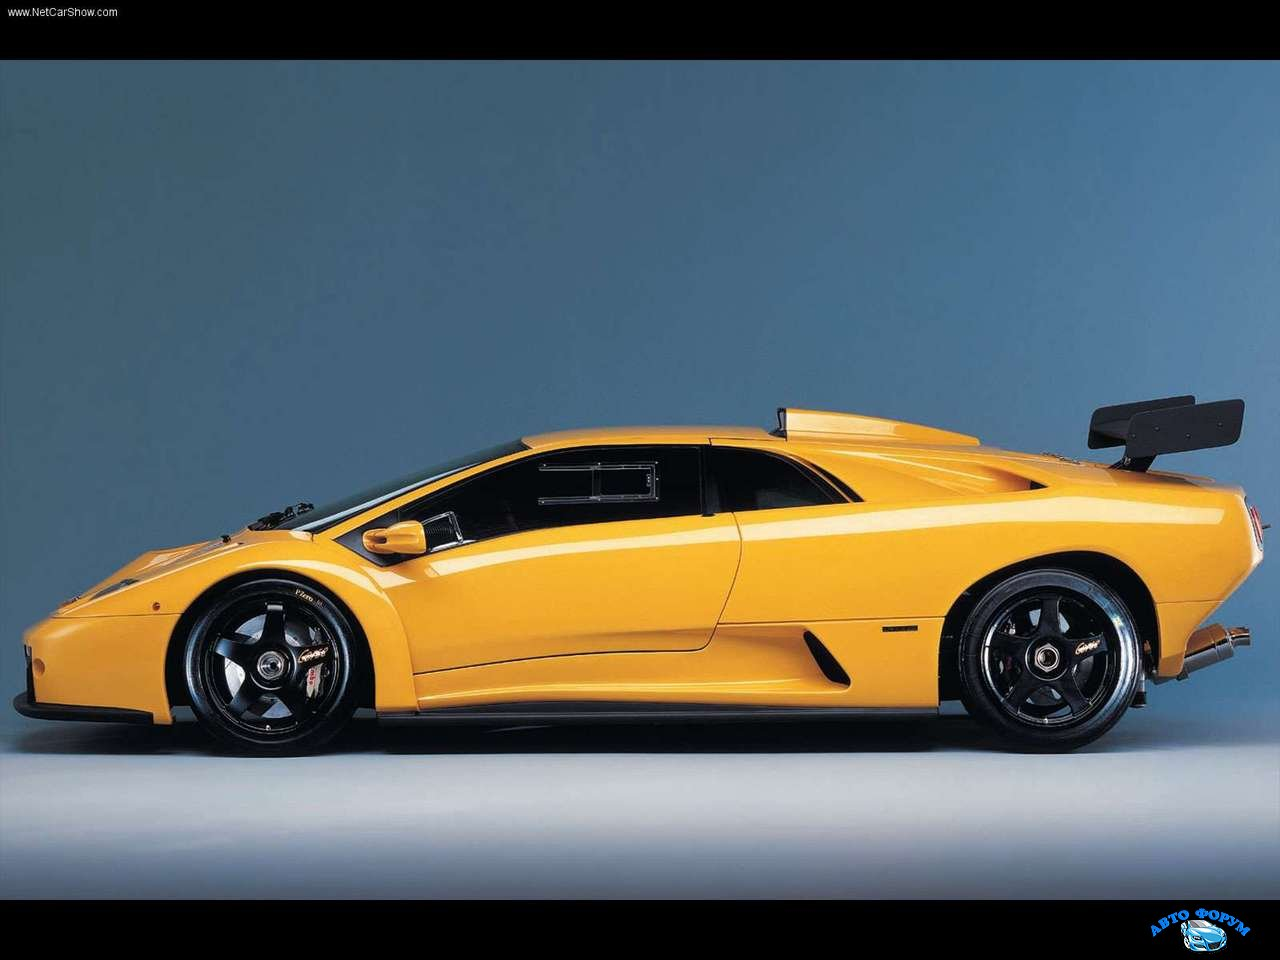 Lamborghini-Diablo_GTR_1999_1280x960_wallpaper_04.jpg